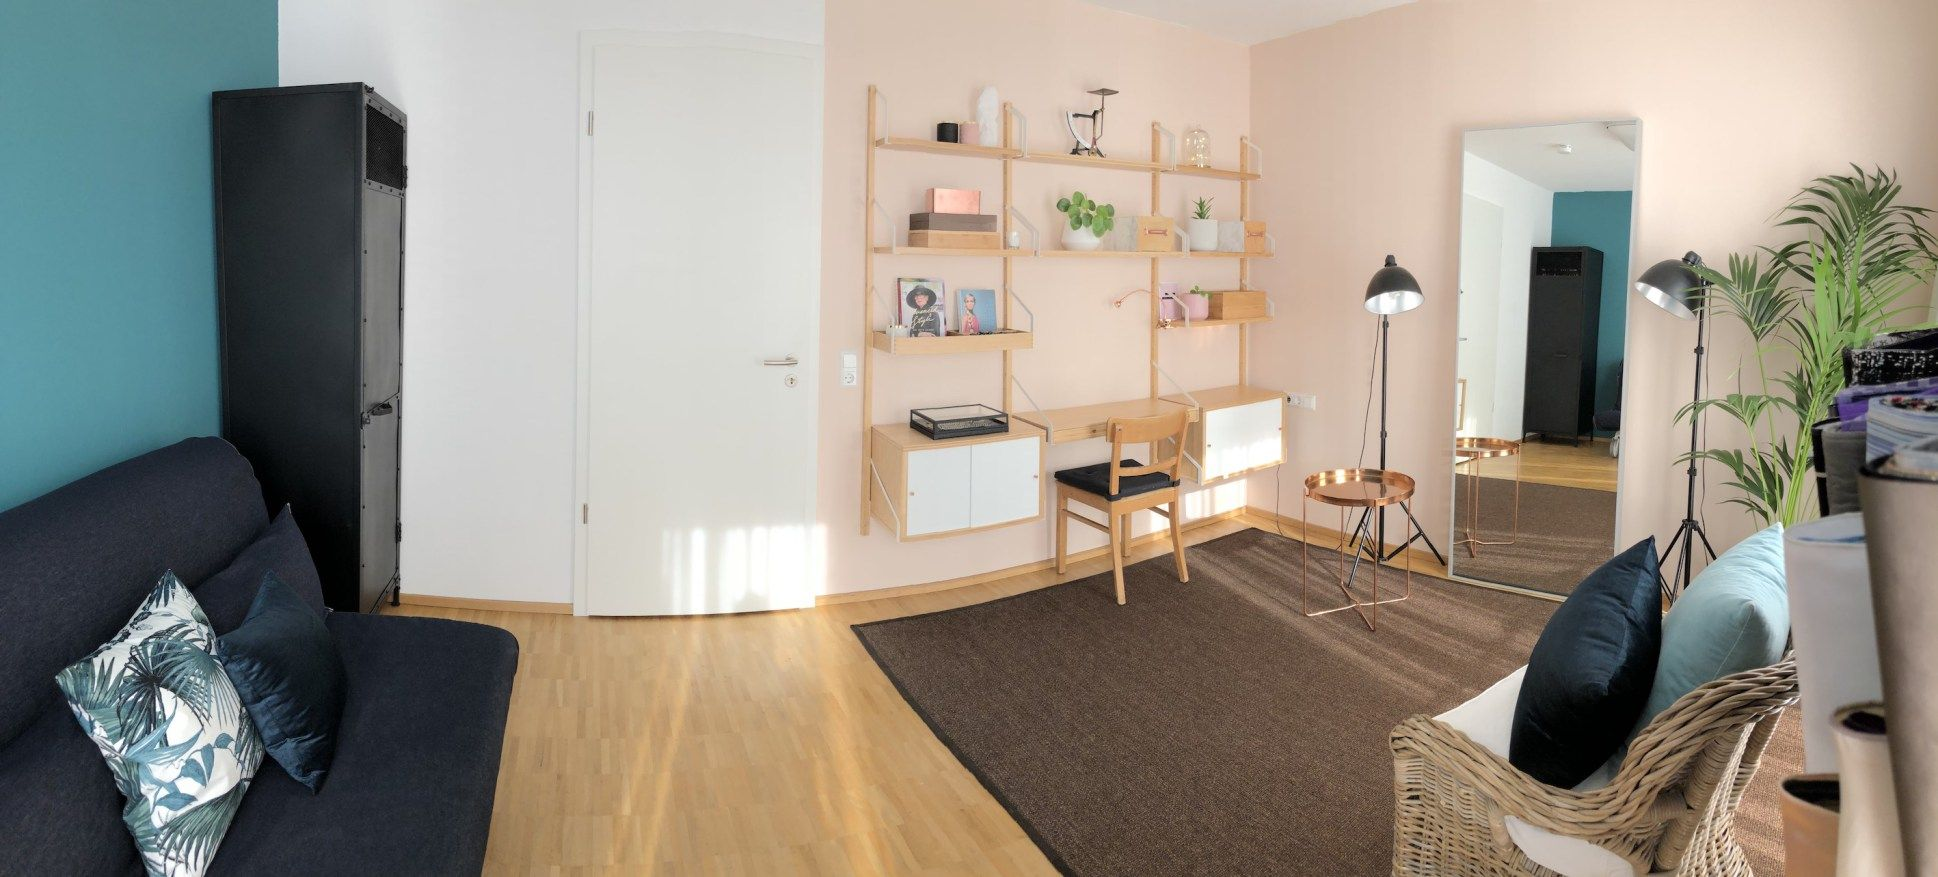 Panoramabild Stil In Nürnberg Beratungsatelier Stil In Nürnberg Farbberatung Stilberatung Millennial Pink Ikea Svalnäs Copper Haus Deko Stil Beratung Stil